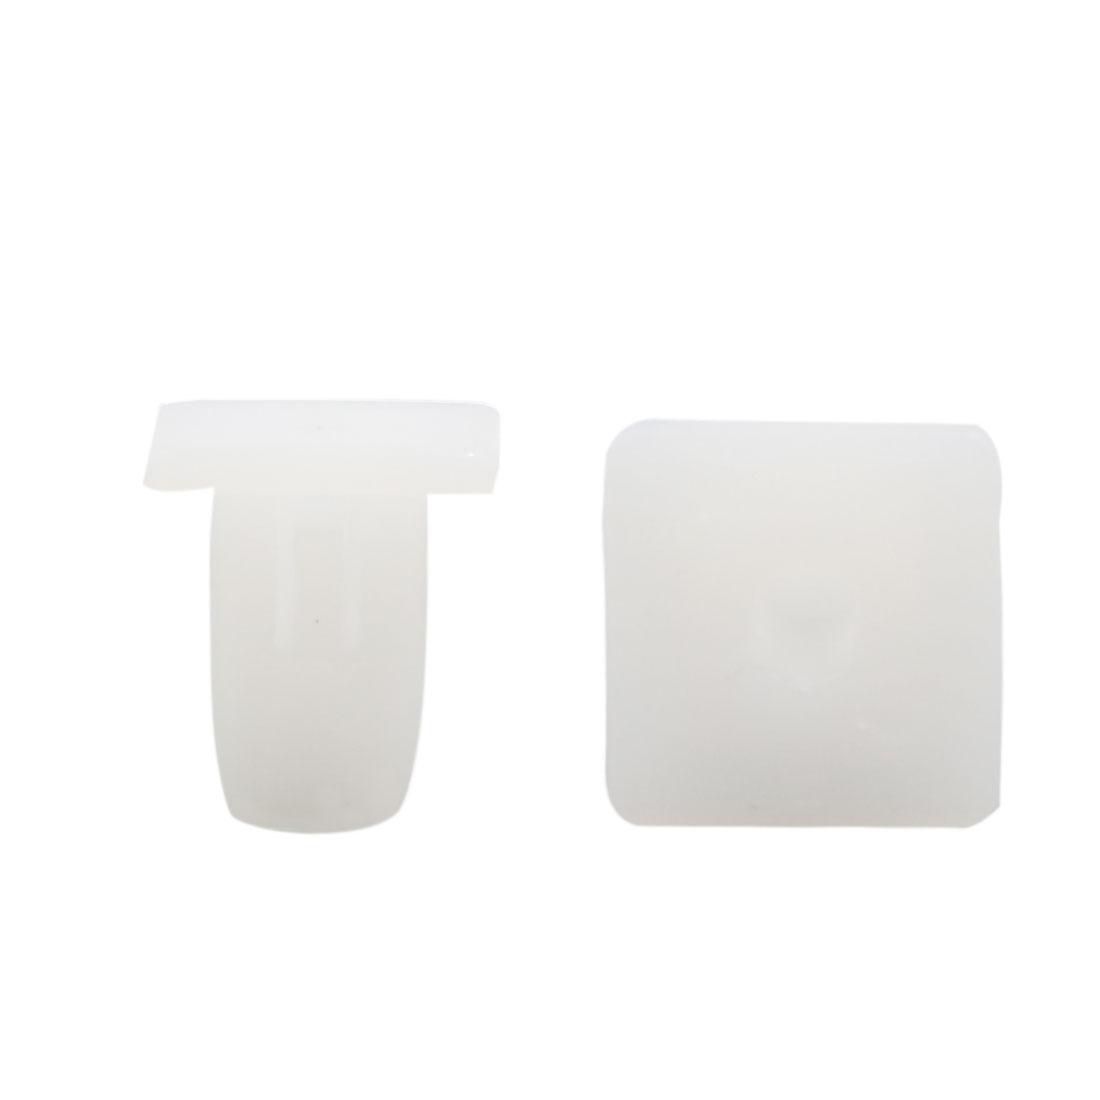 50 Pcs White 10 x 8mm Dia Hole Plastic Fender Body Door Trim Panel Hood Clips